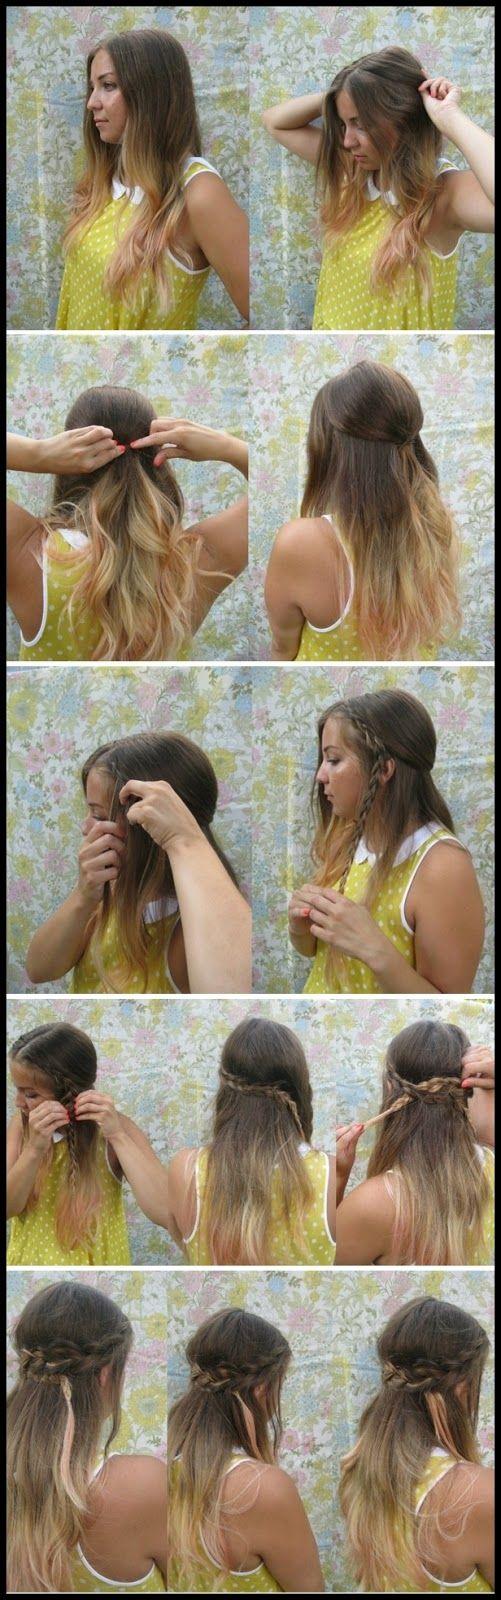 Top 5 hair braiding tutorials collection | Hairstyles |Hair Ideas |Updos